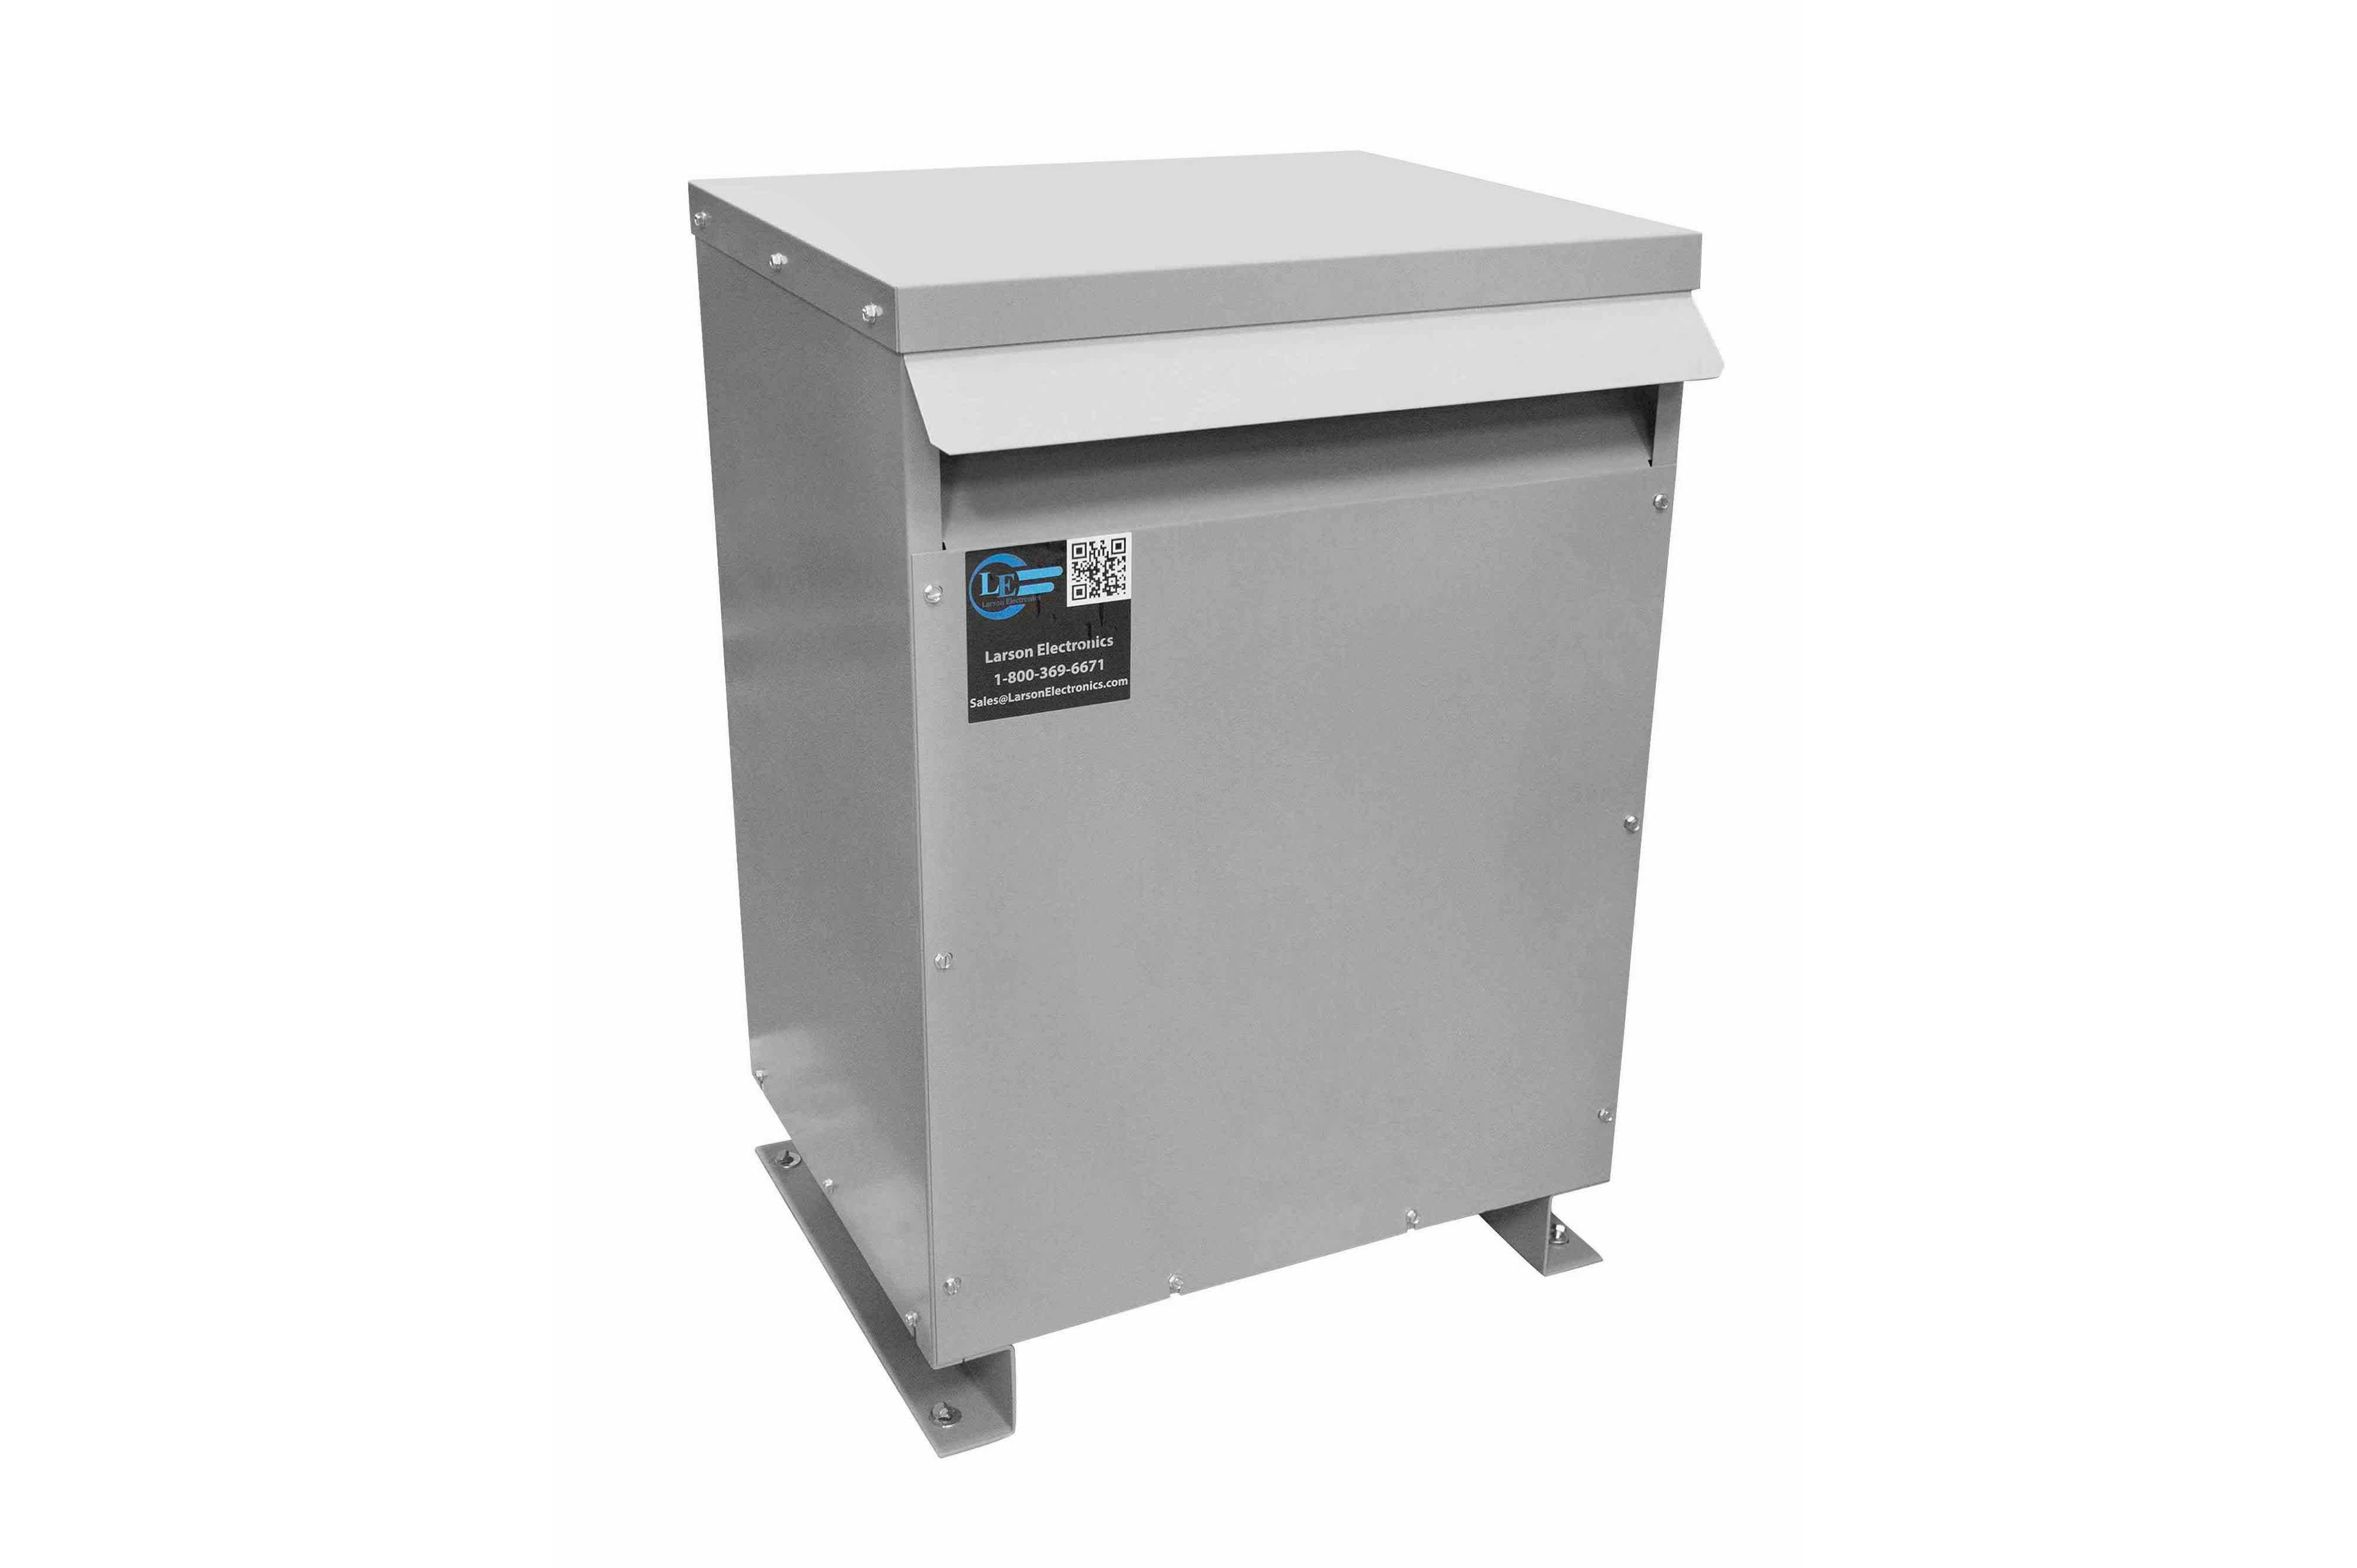 700 kVA 3PH Isolation Transformer, 575V Wye Primary, 208Y/120 Wye-N Secondary, N3R, Ventilated, 60 Hz